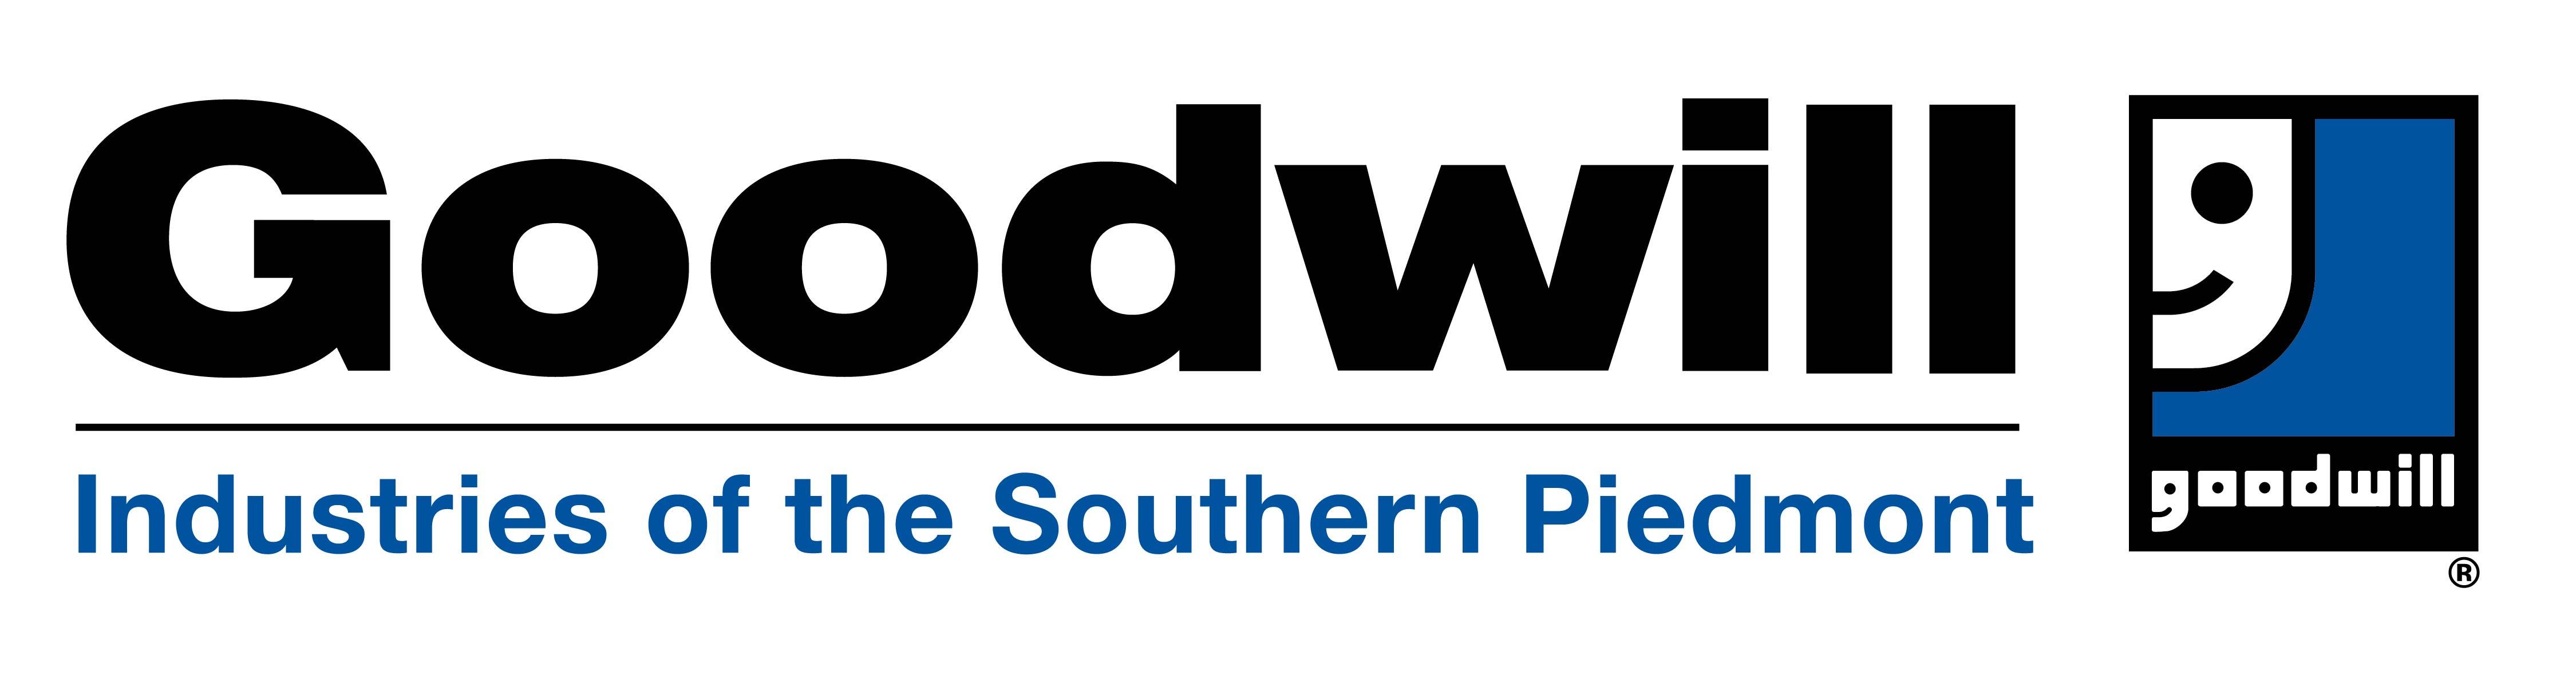 Goodwill_Logo.jpg